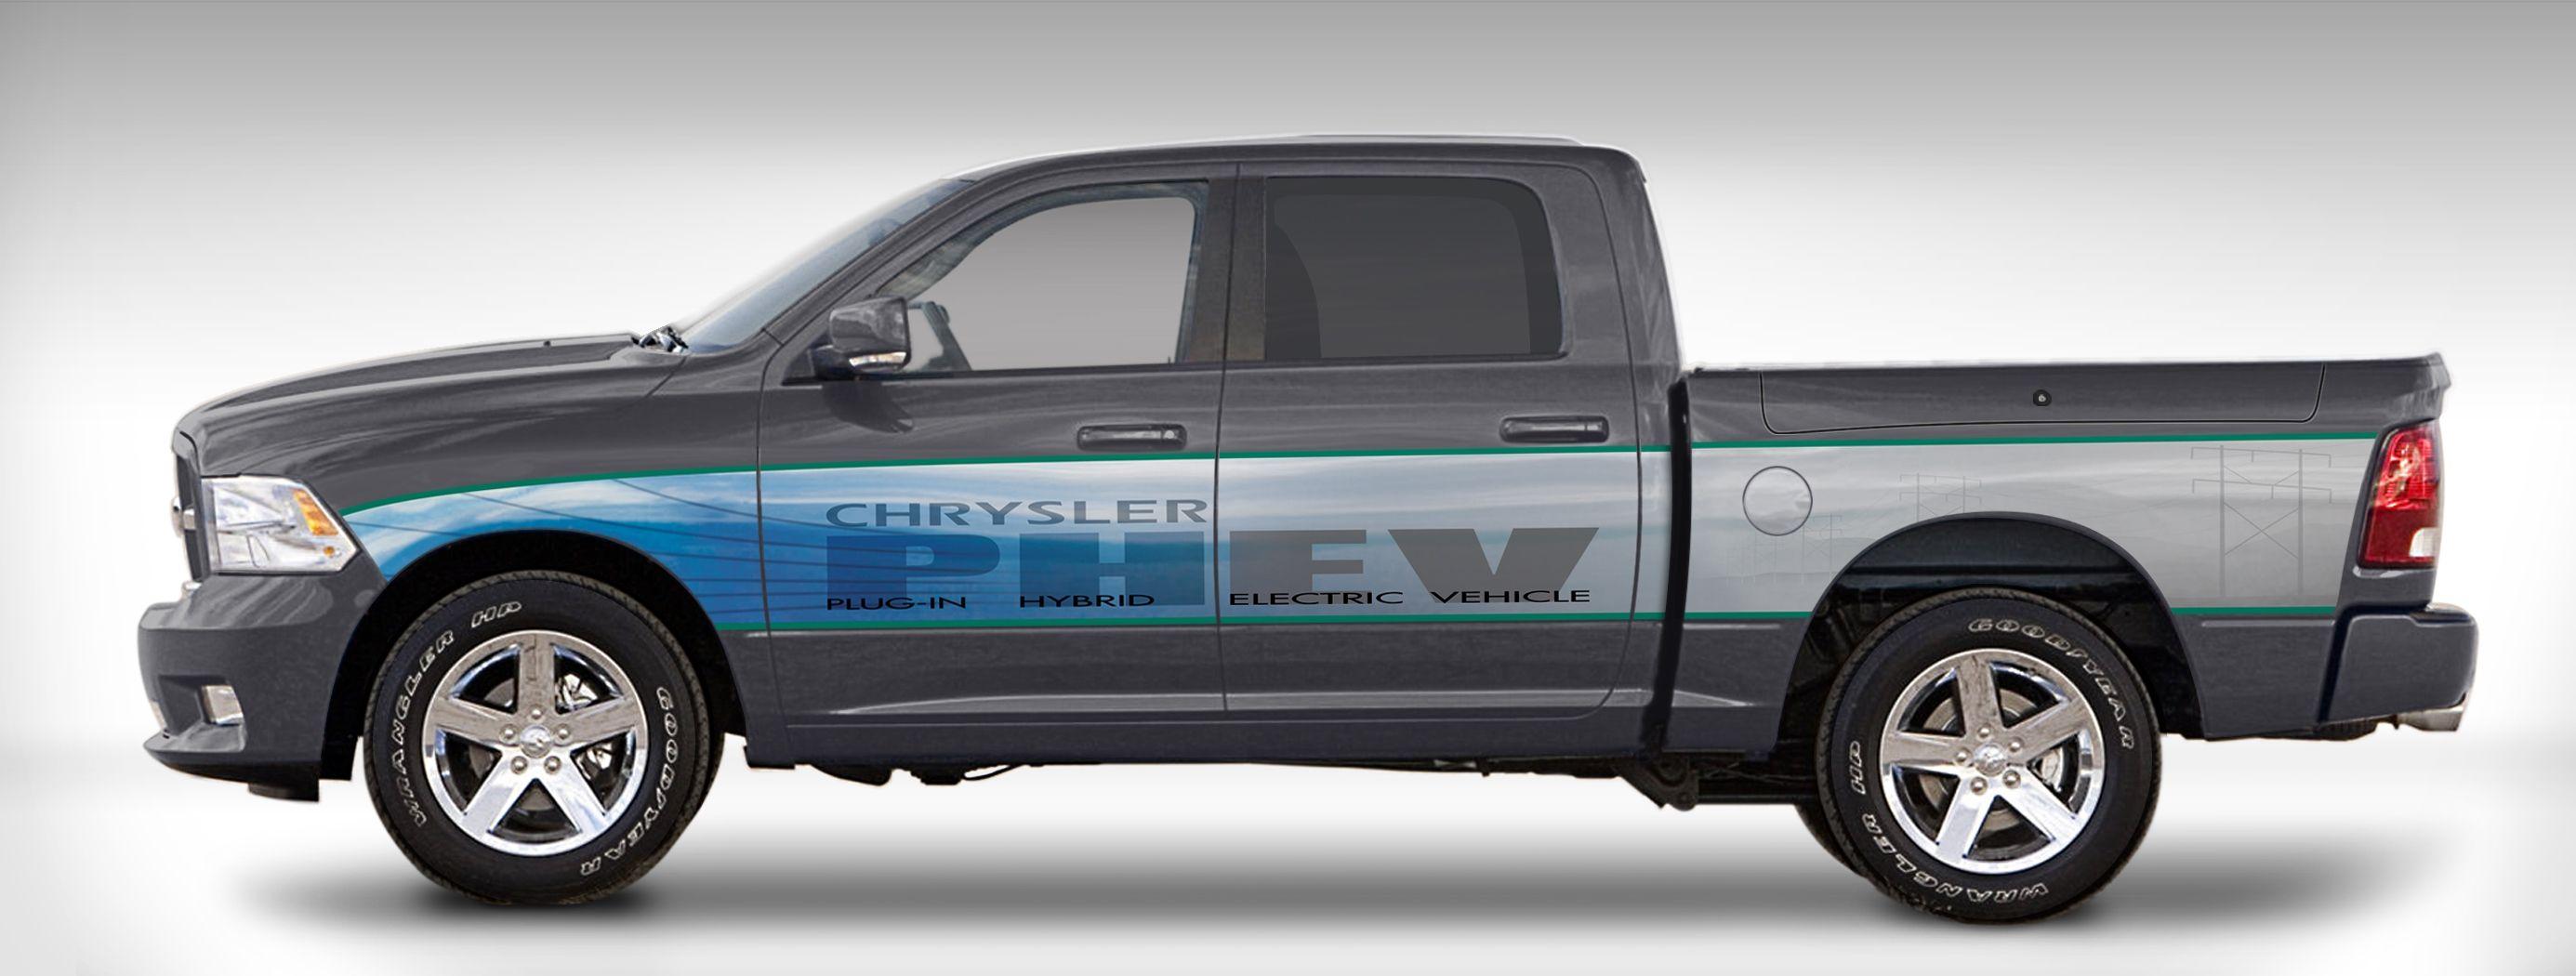 Chrysler's Ram 1500 PHEV Program Shows Positive Results